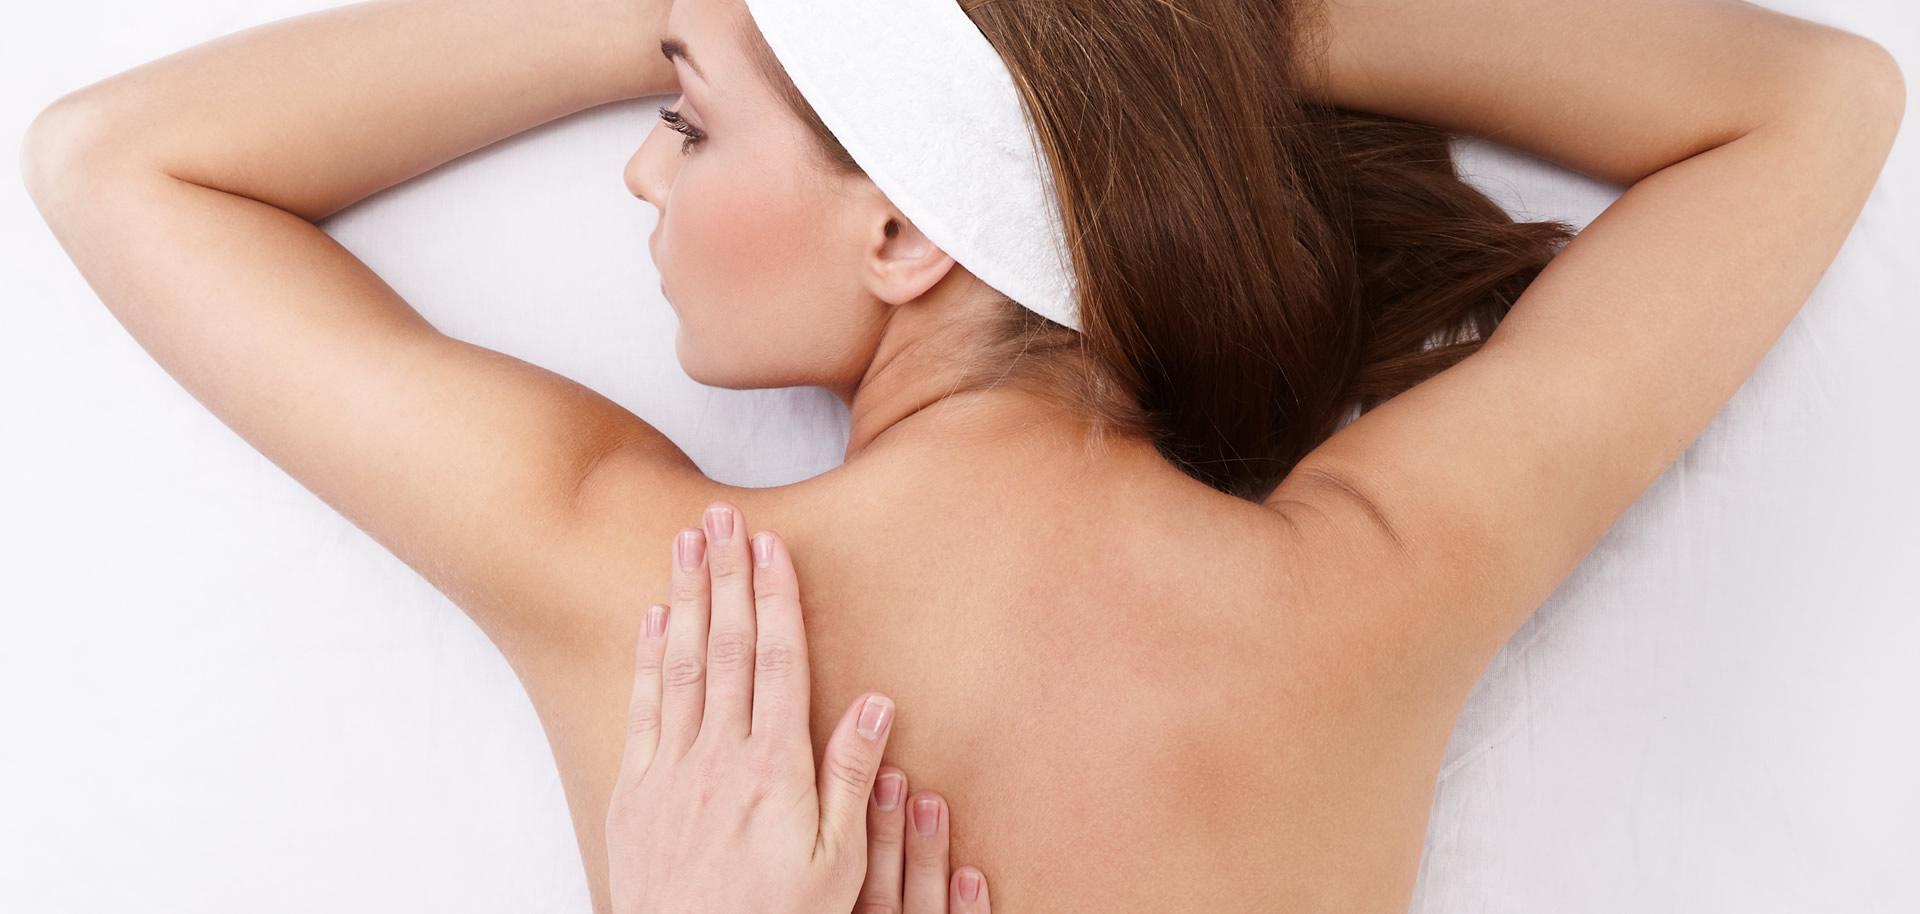 swedish escorts body to body massage